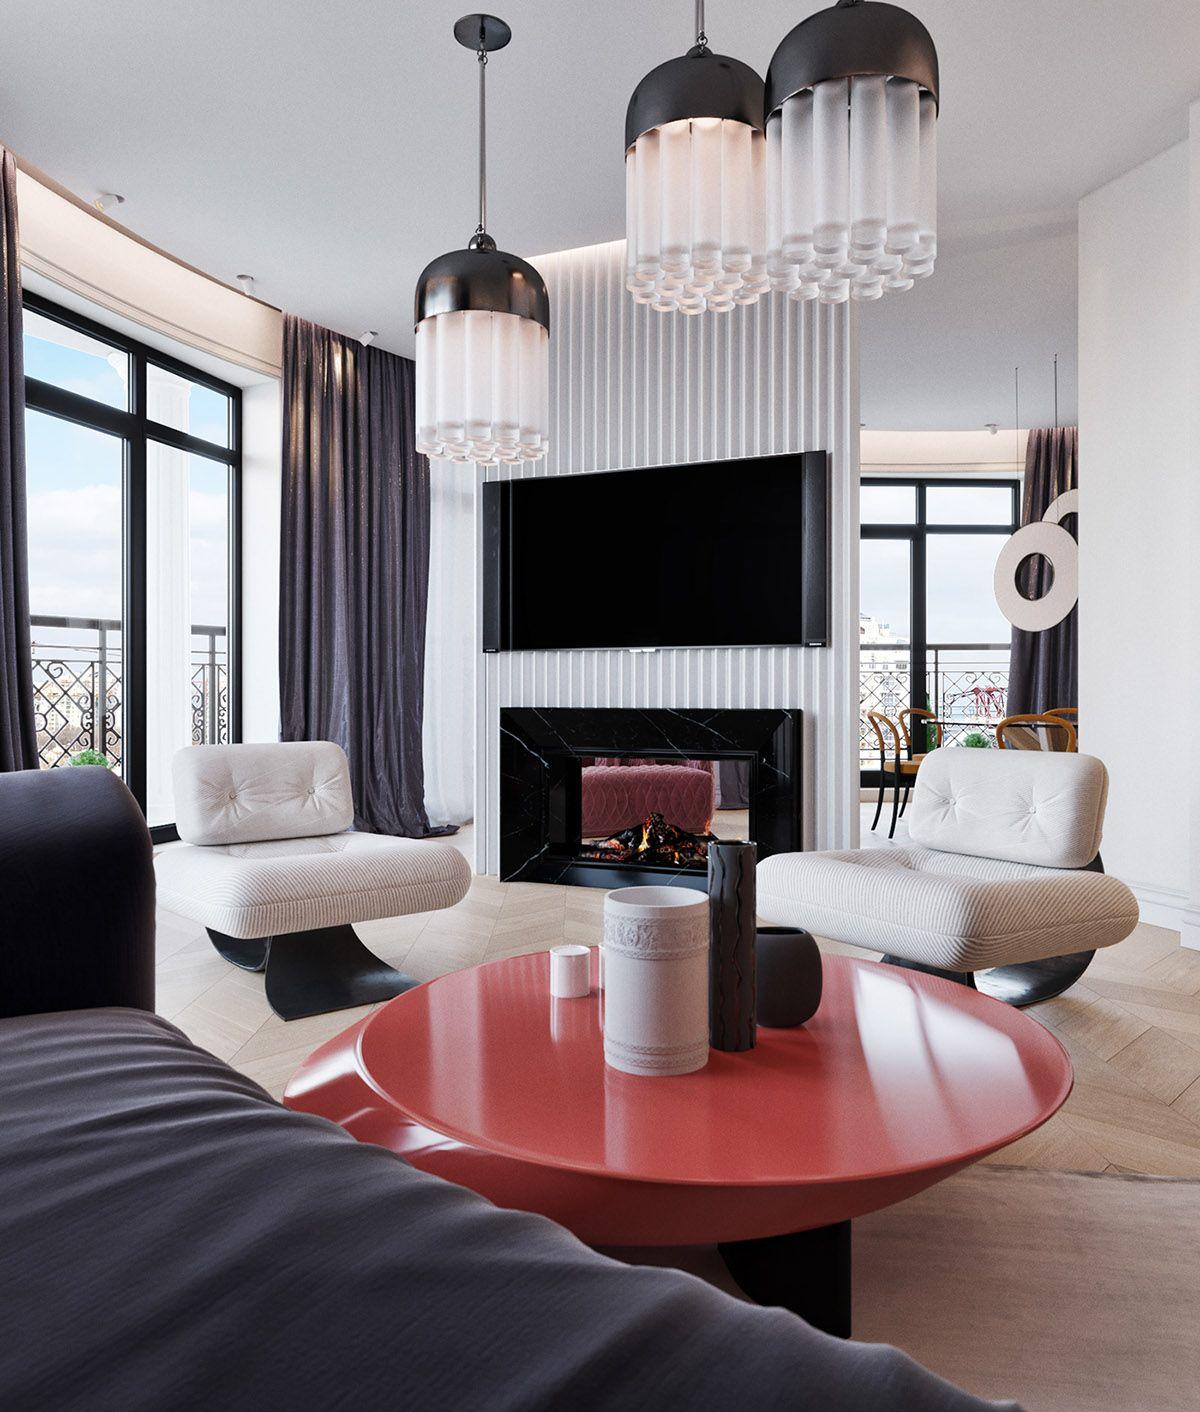 One Space Two Design Options Modern Houses Interior Living Design Furniture Design Living Room